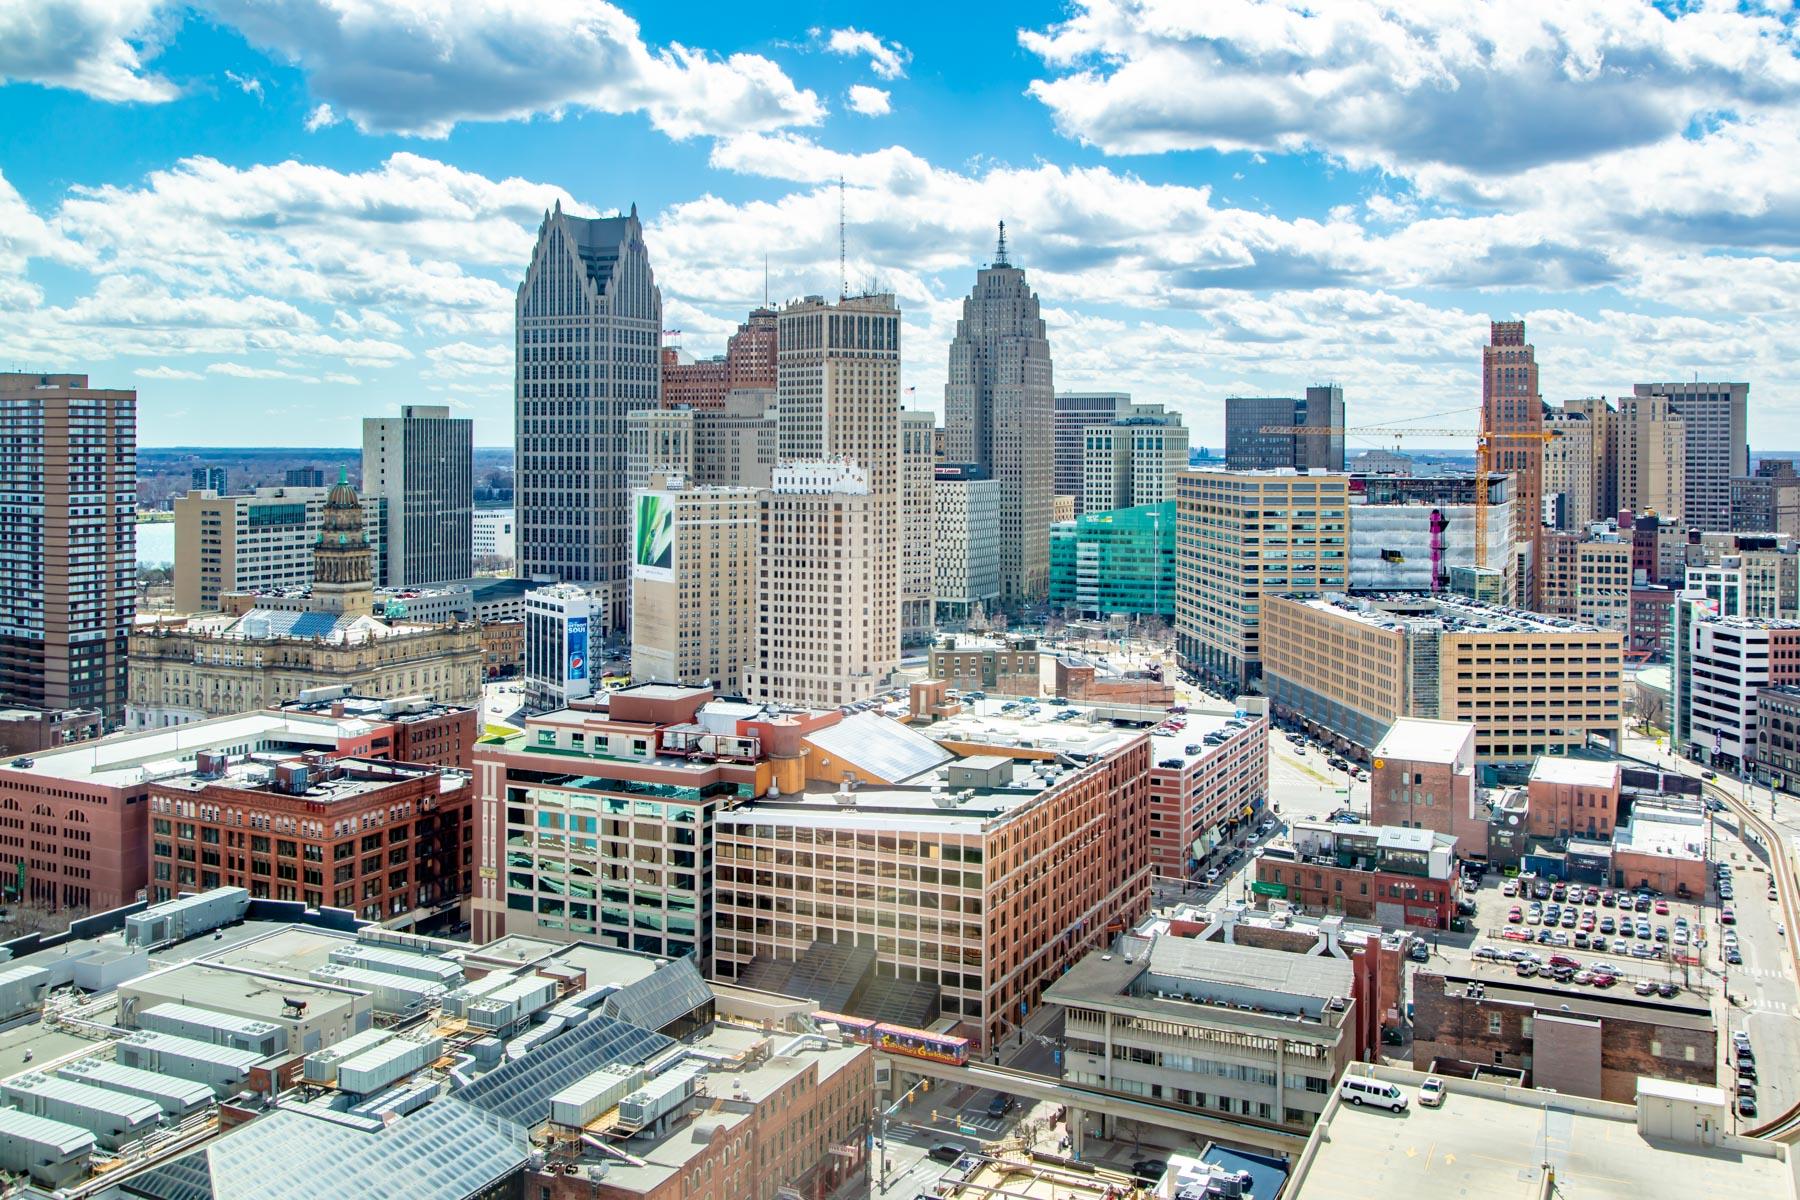 Detroit from GtCH Room - 1z3a7179_1